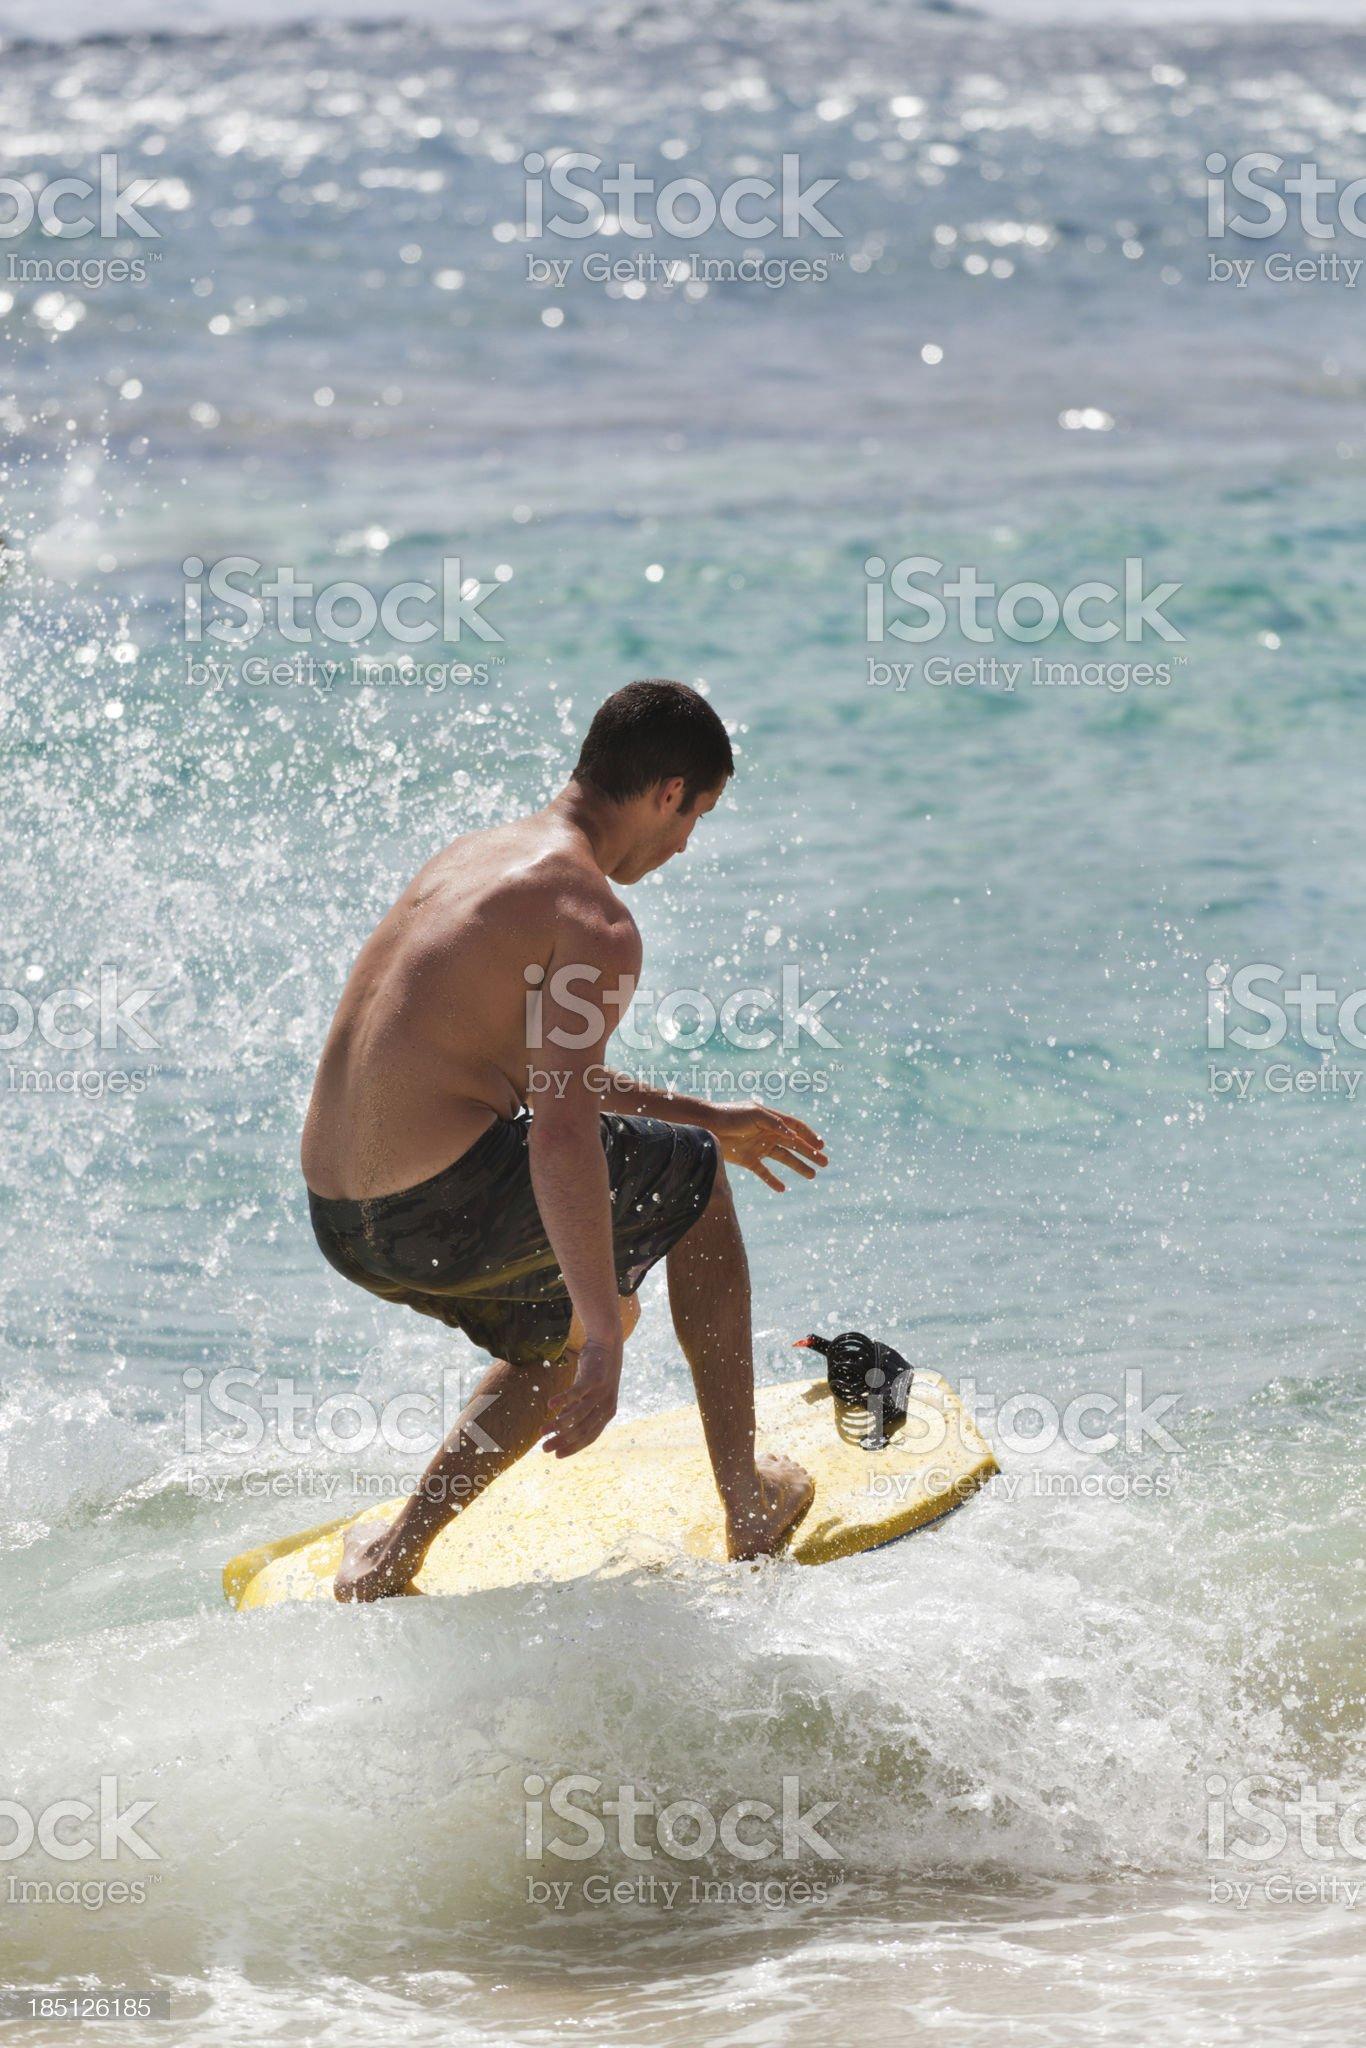 Booggie Boarder Surfing in Kauai, Hawaii royalty-free stock photo